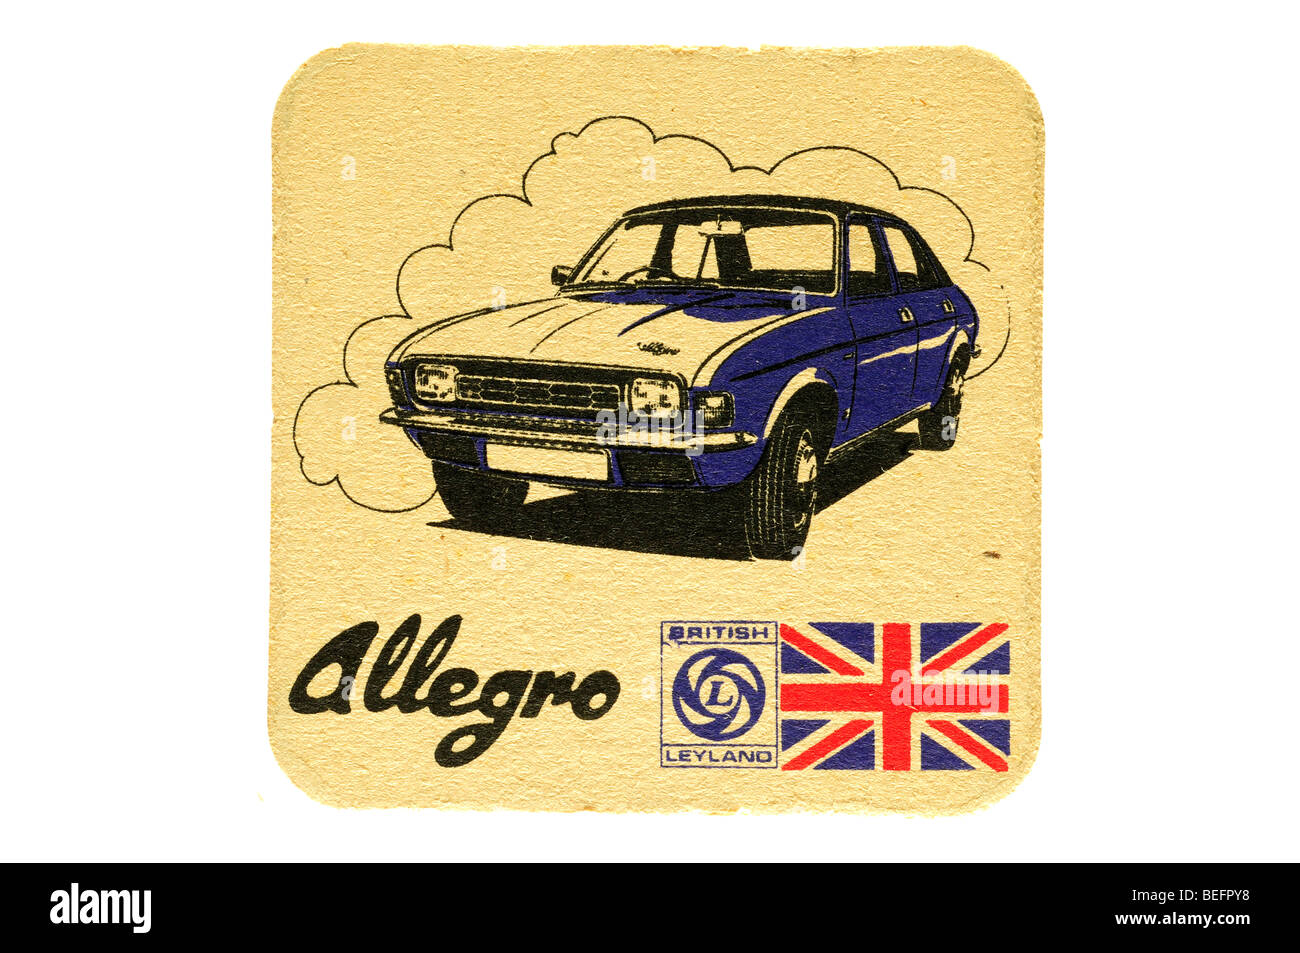 Allegro BRITISH LEYLAND Immagini Stock